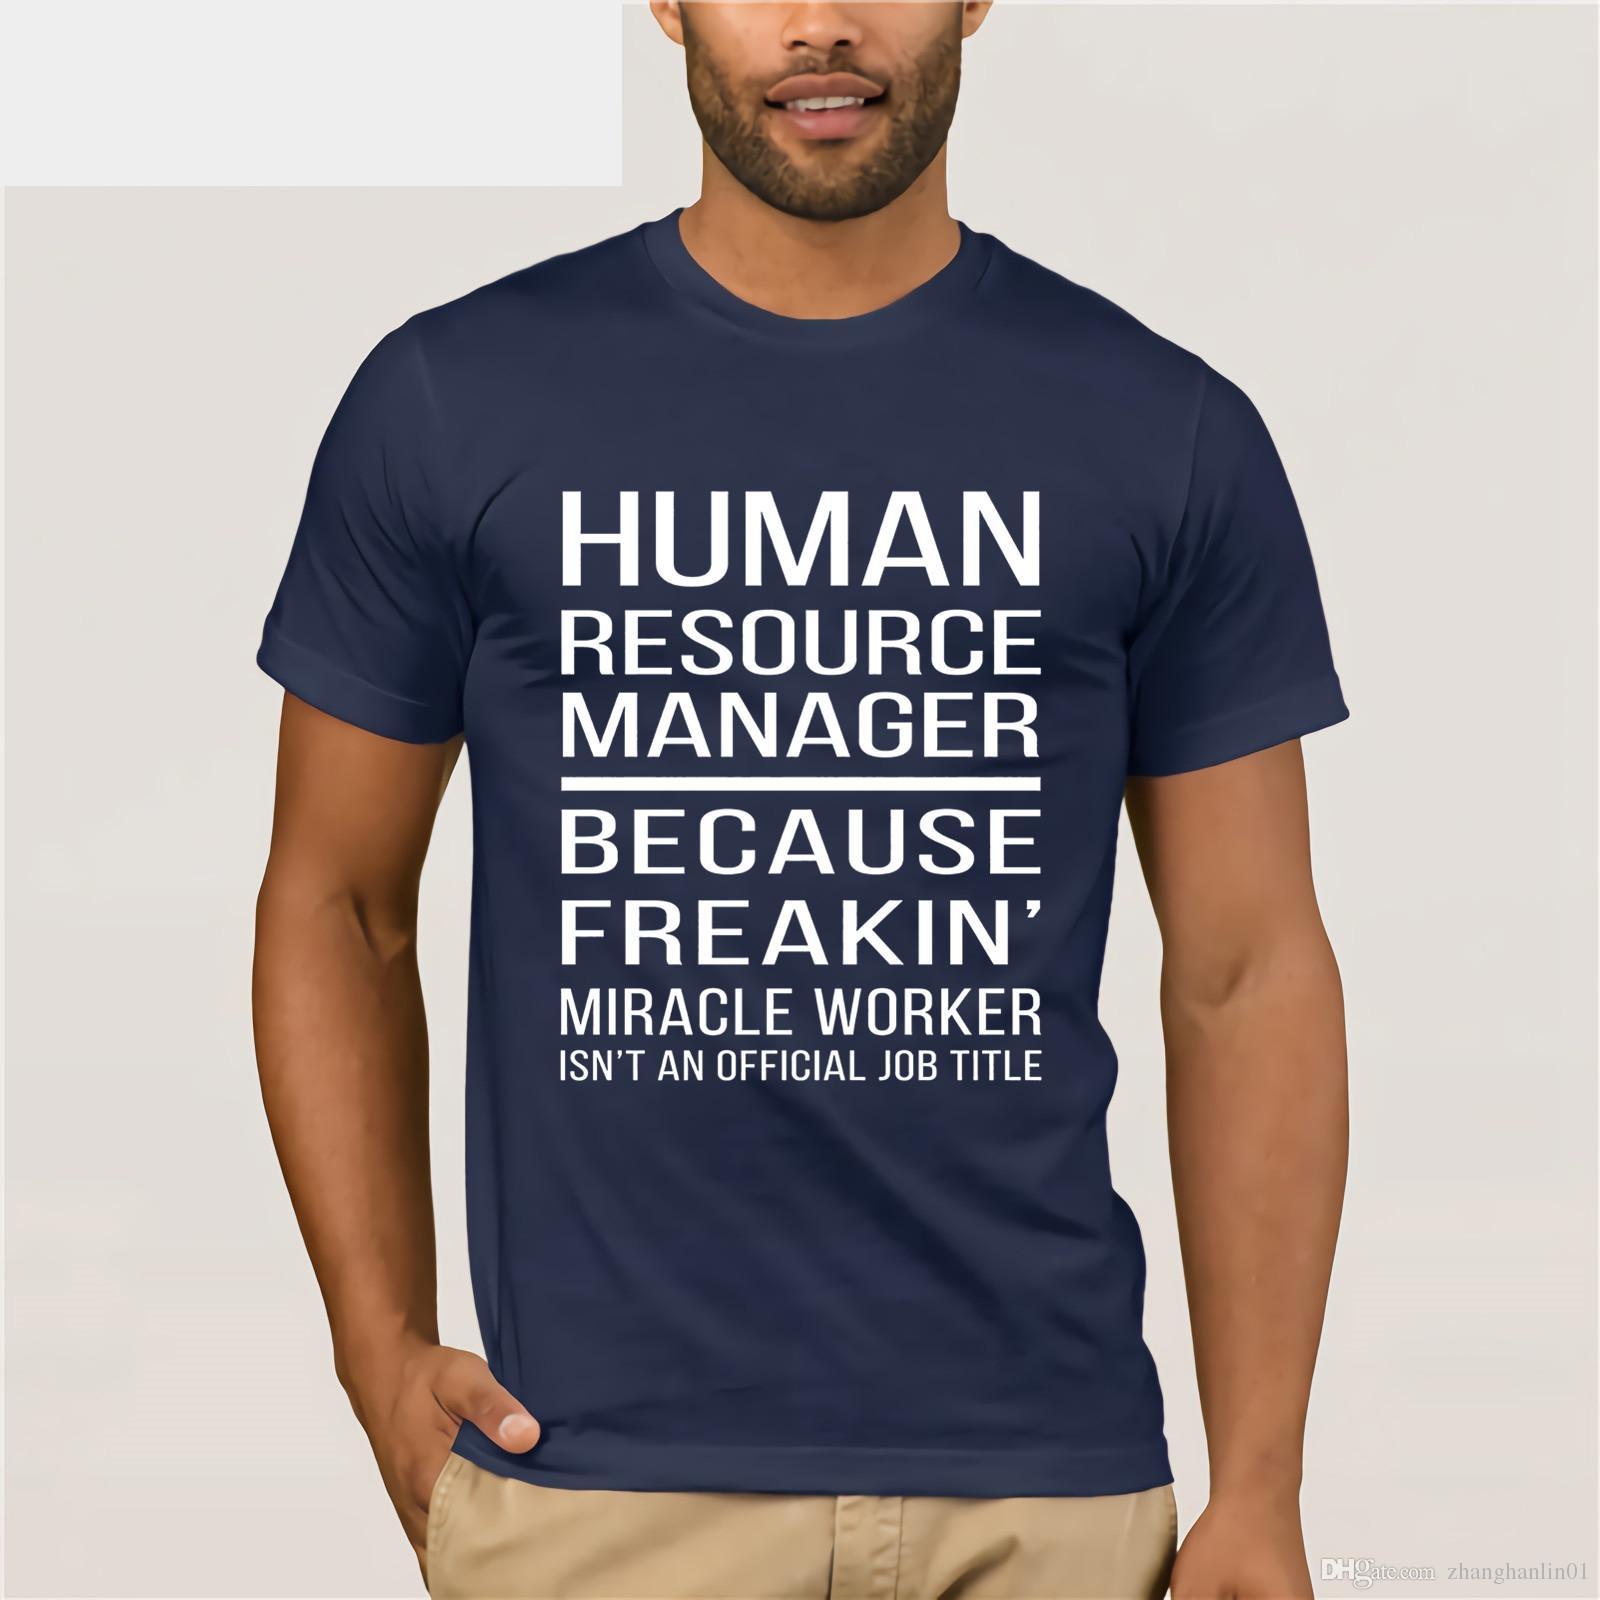 f1a0a43d0b HR Manager - Because Freakin' miracle worker T-shirt Men's shirt trendy  t-shirt